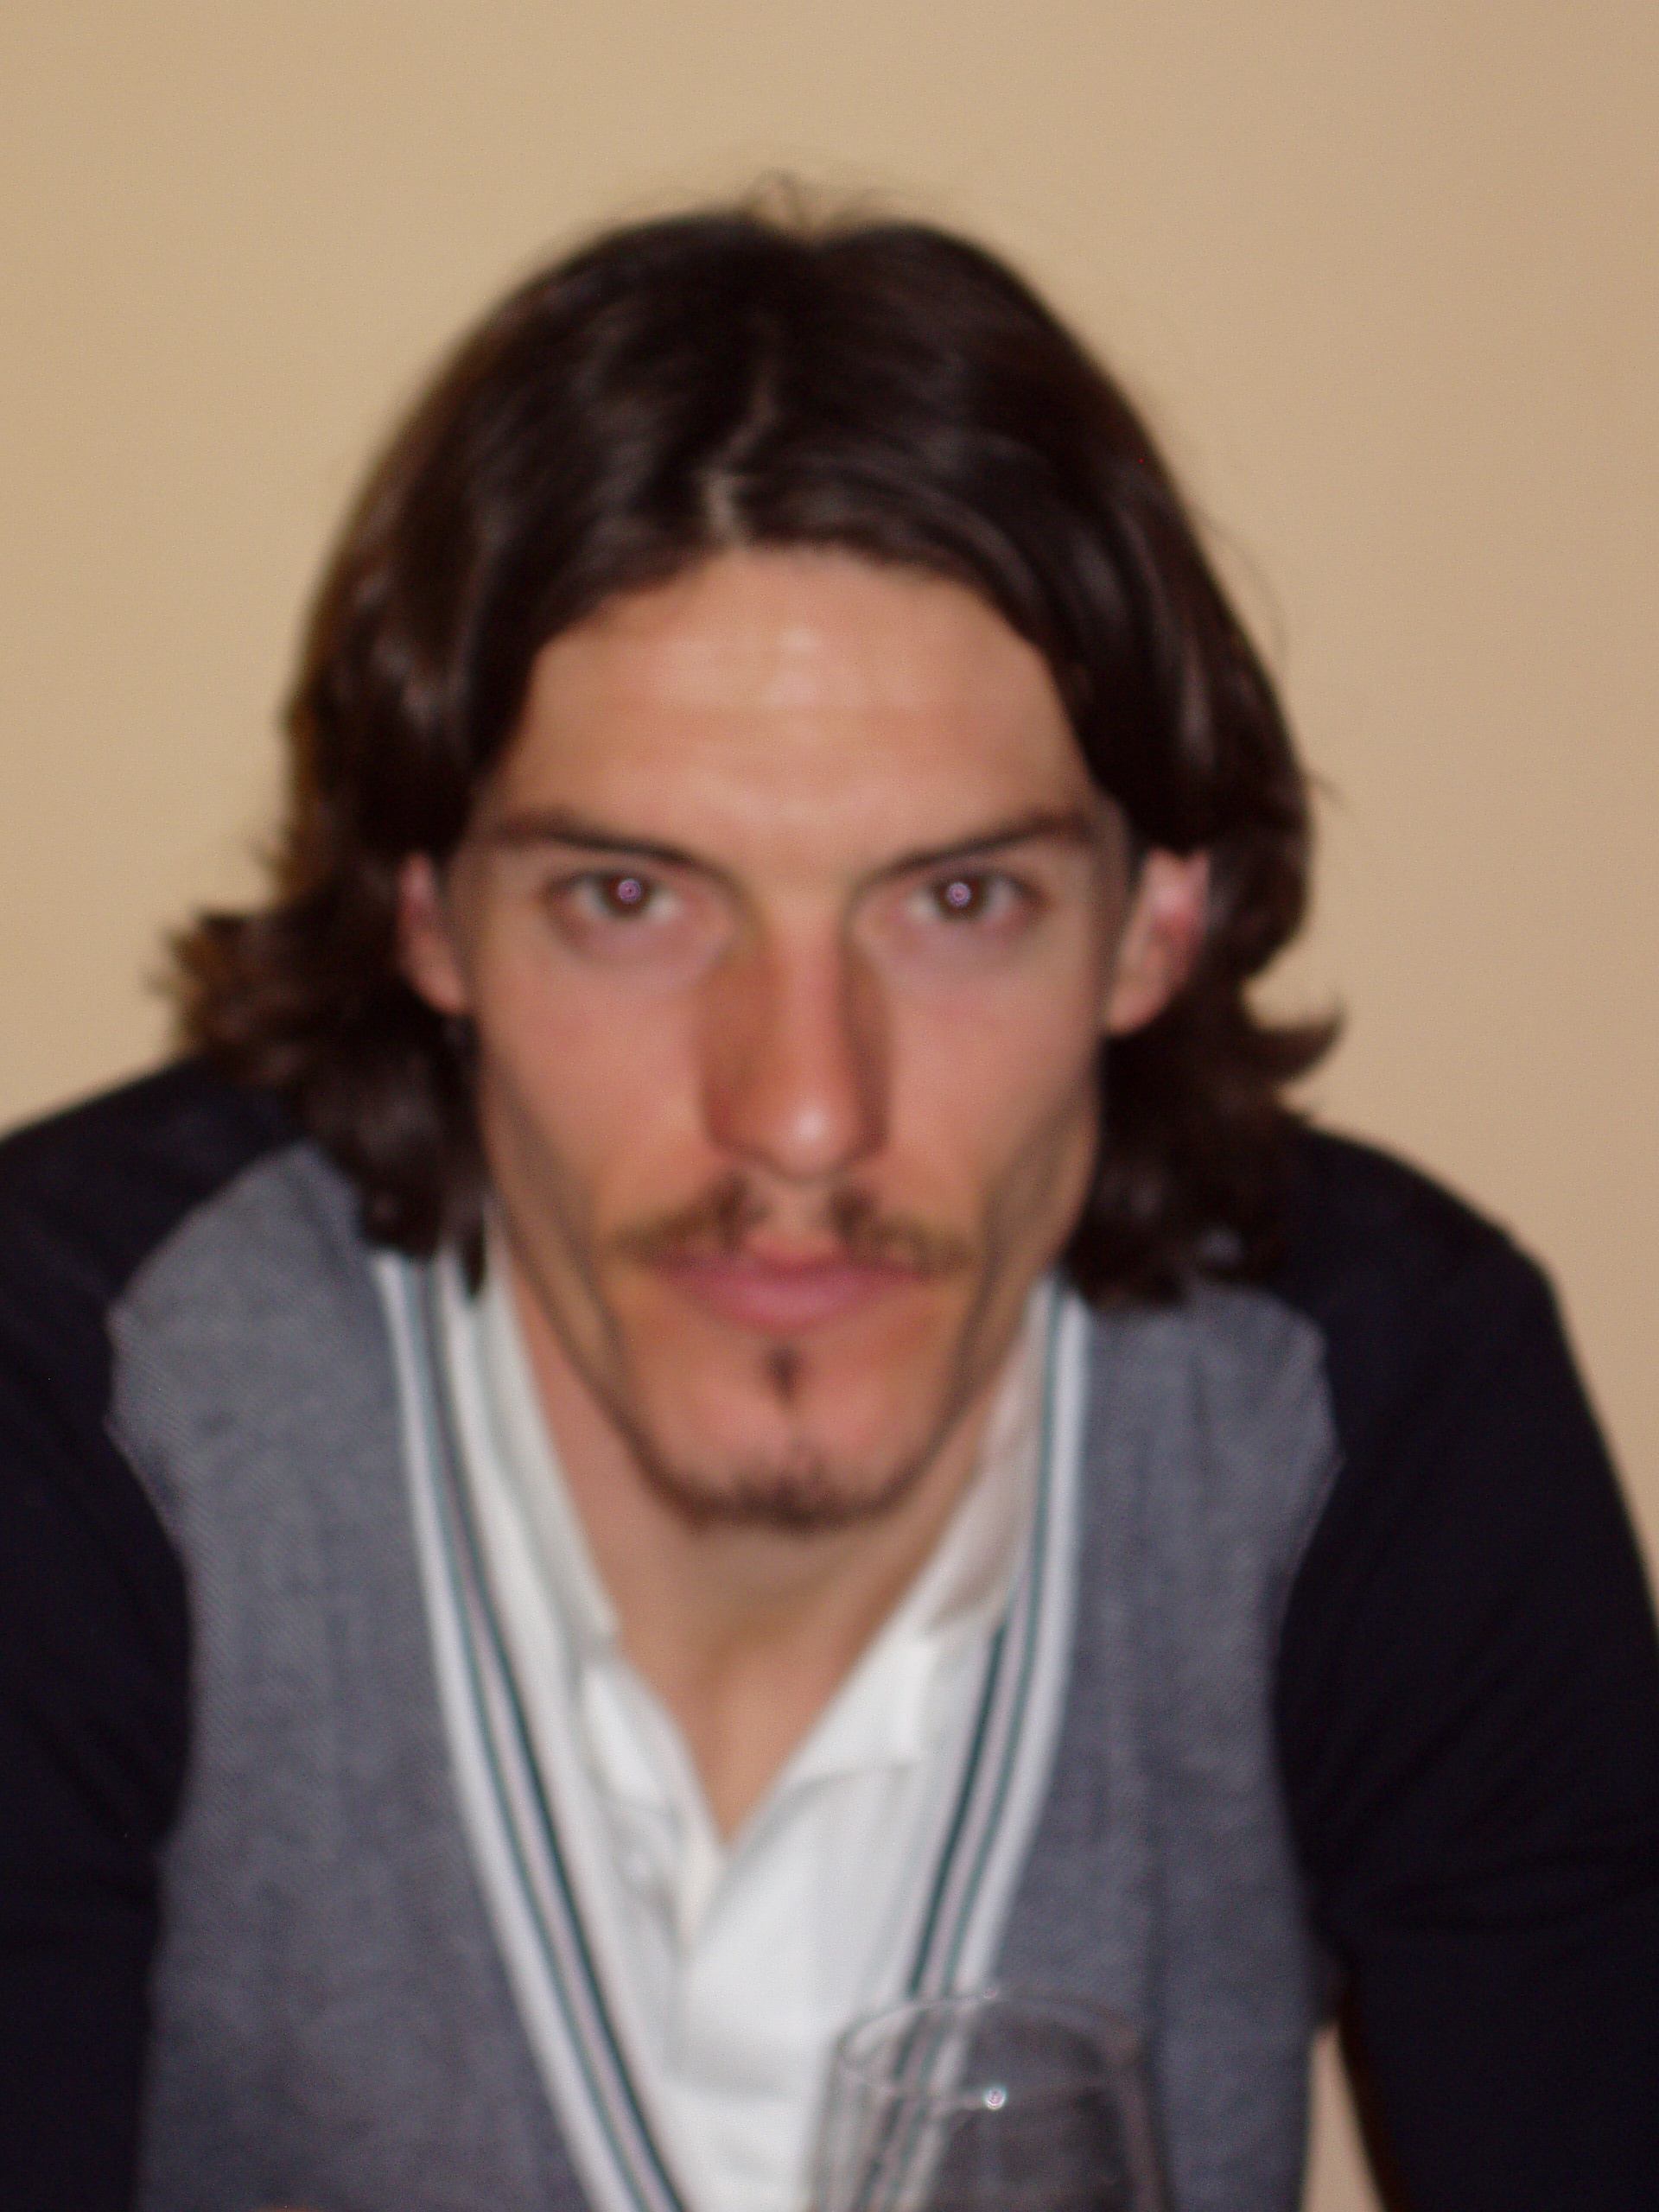 Natale 2009.File Riccardo Nardini Natale 2009 Jpg Wikimedia Commons